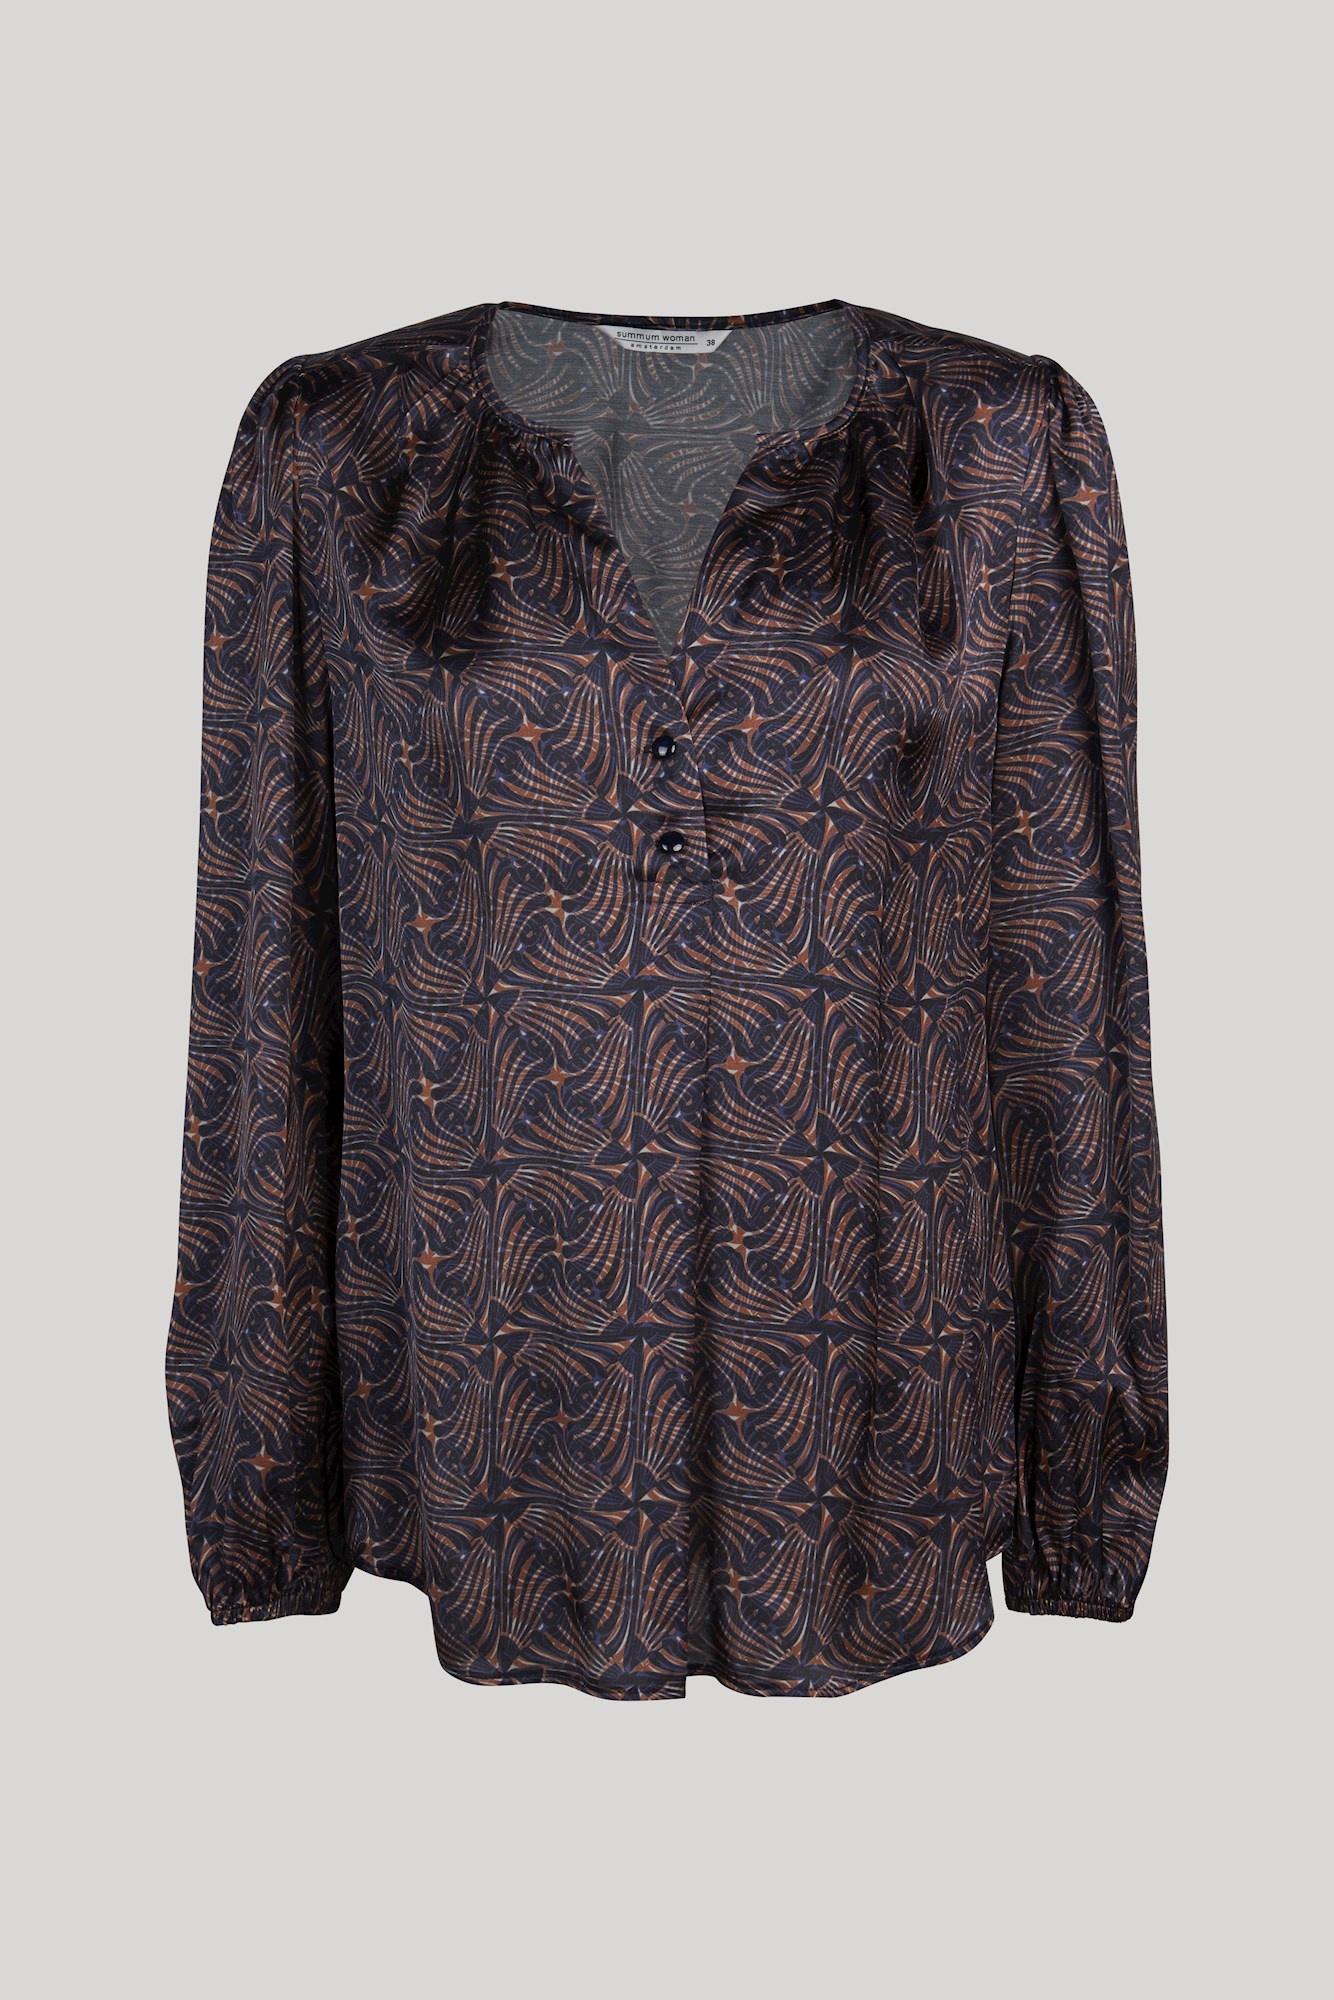 Summum blouse 2S2654-11524-1